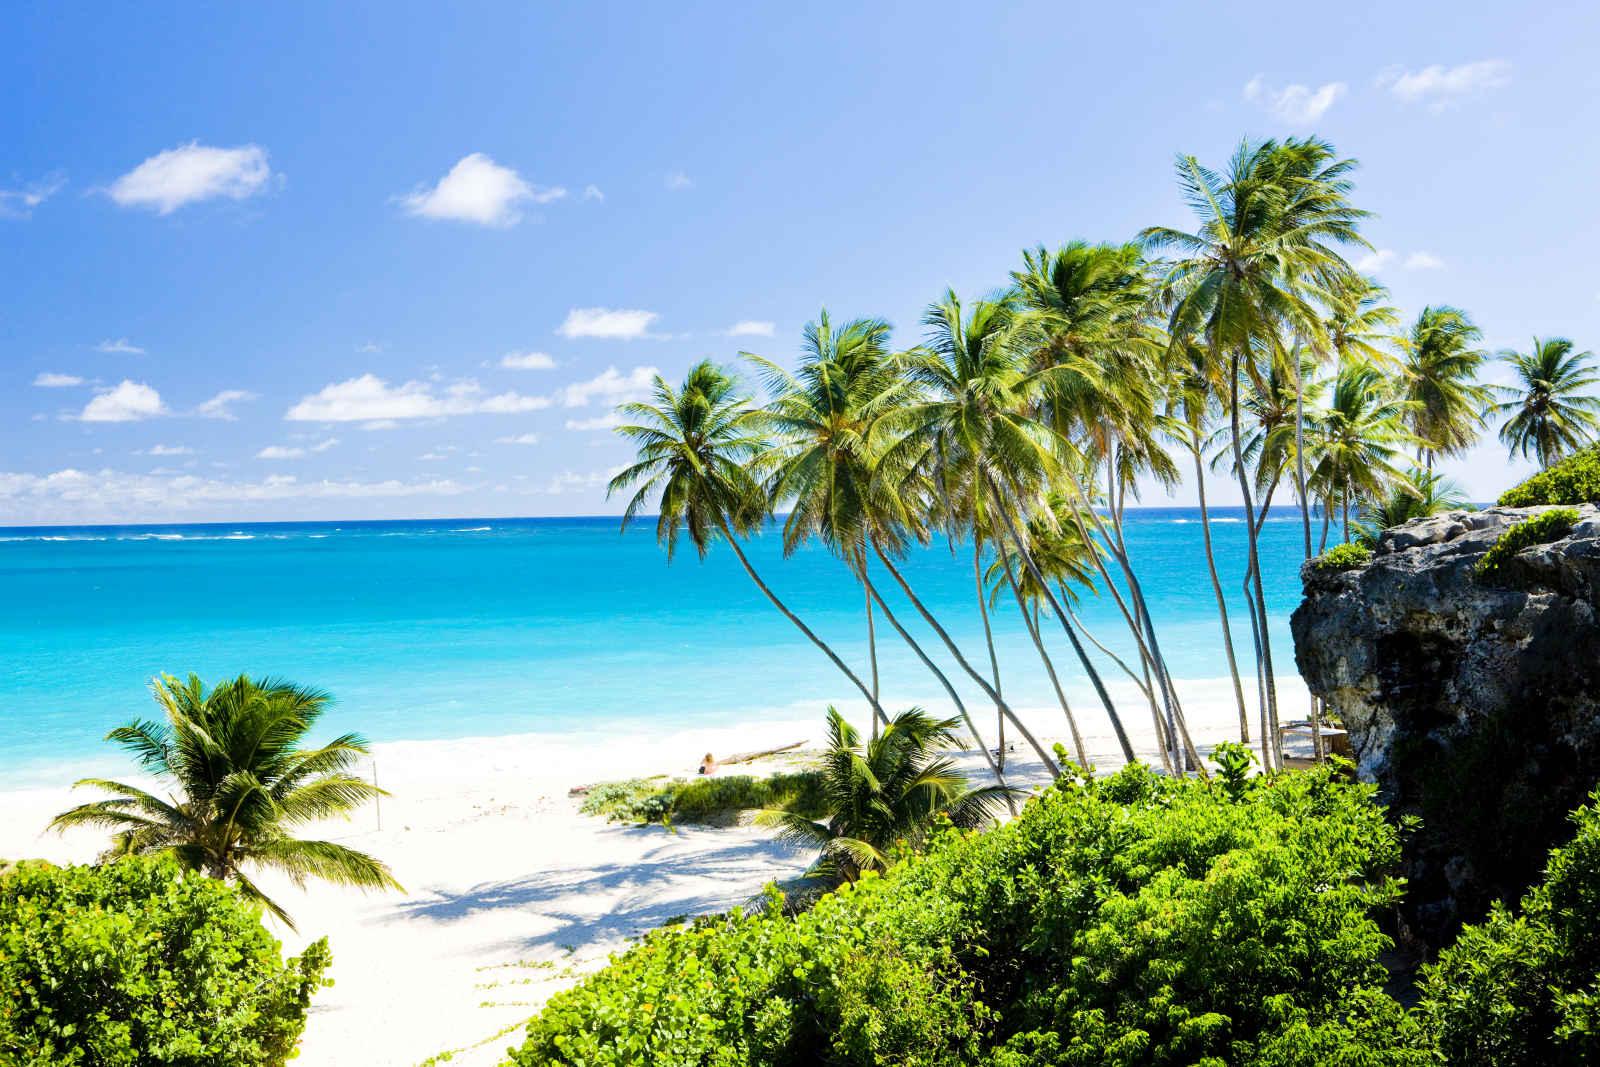 Antilles : Rêveries antillaises (îles grenadines)